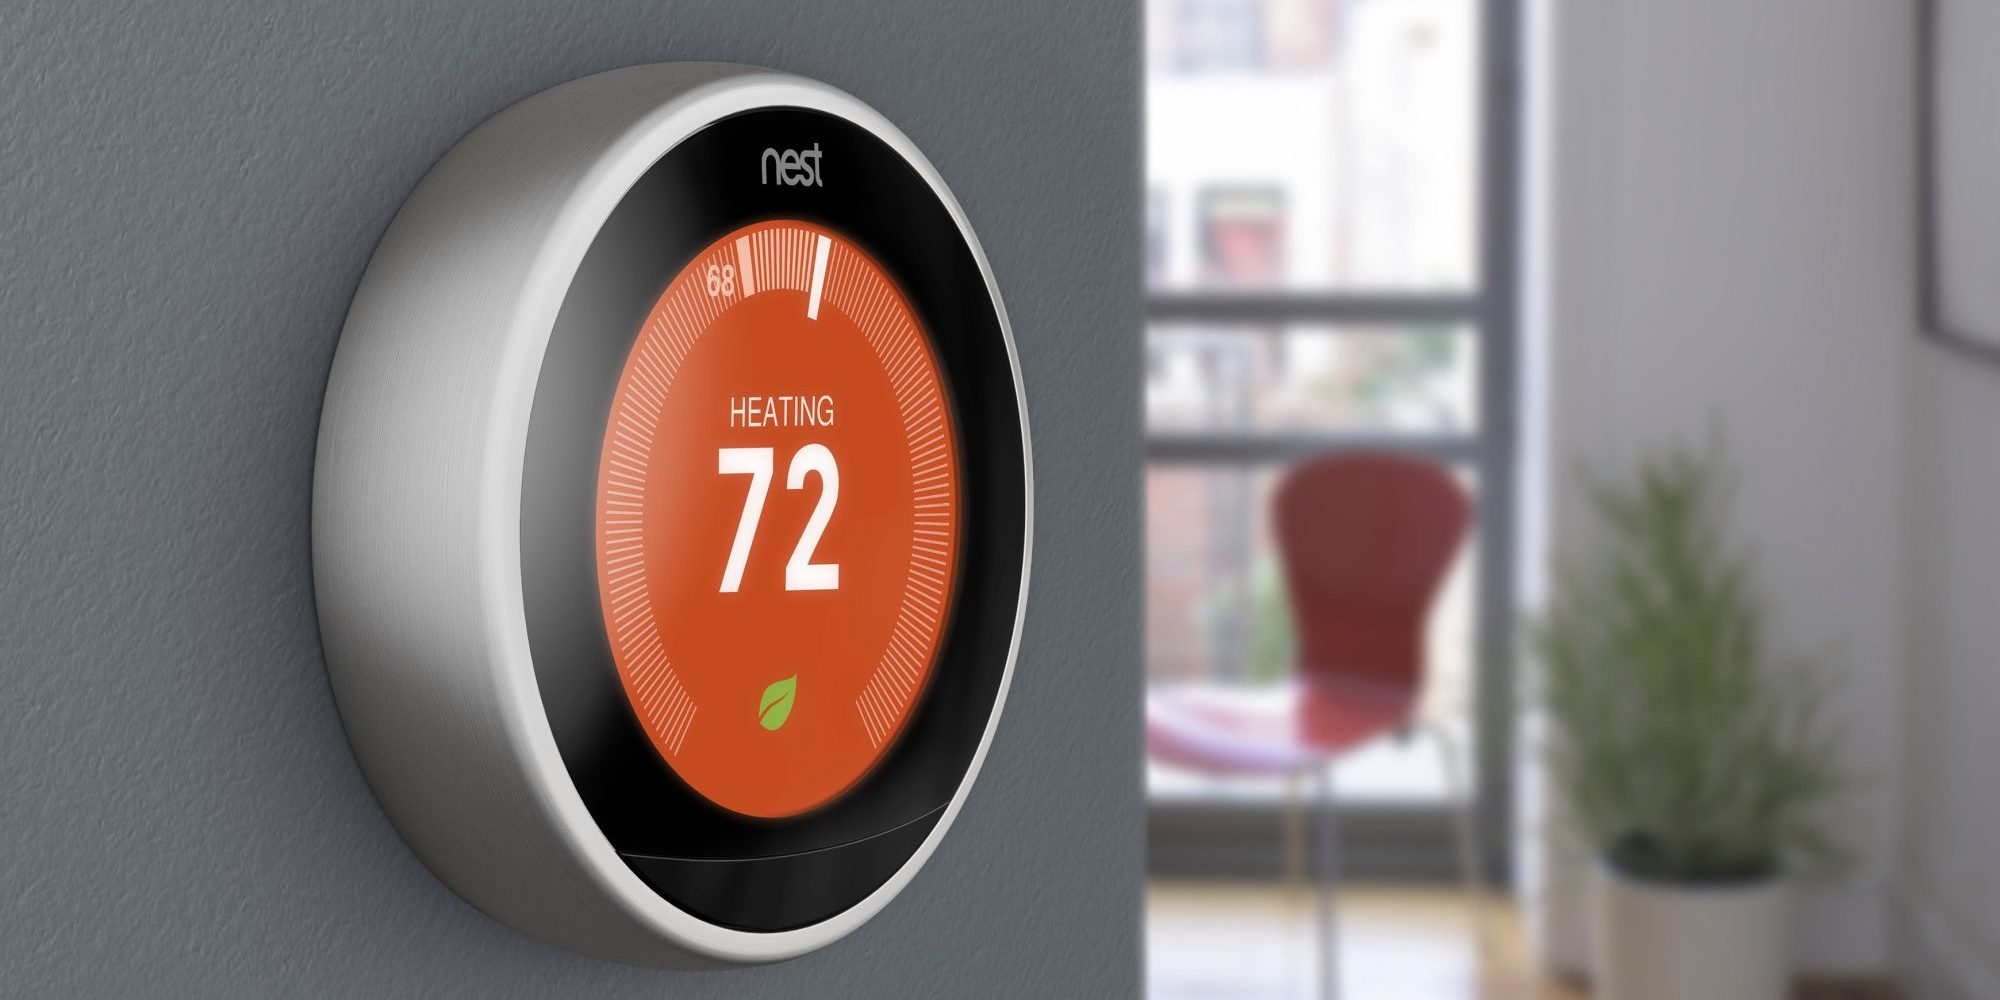 9to5Toys Letzter Anruf: Nest Smart-Thermostat $ 174, Sony ANC-Funkkopfhörer $ 284, TP-Link Mesh-WLAN-System $ 139, mehr